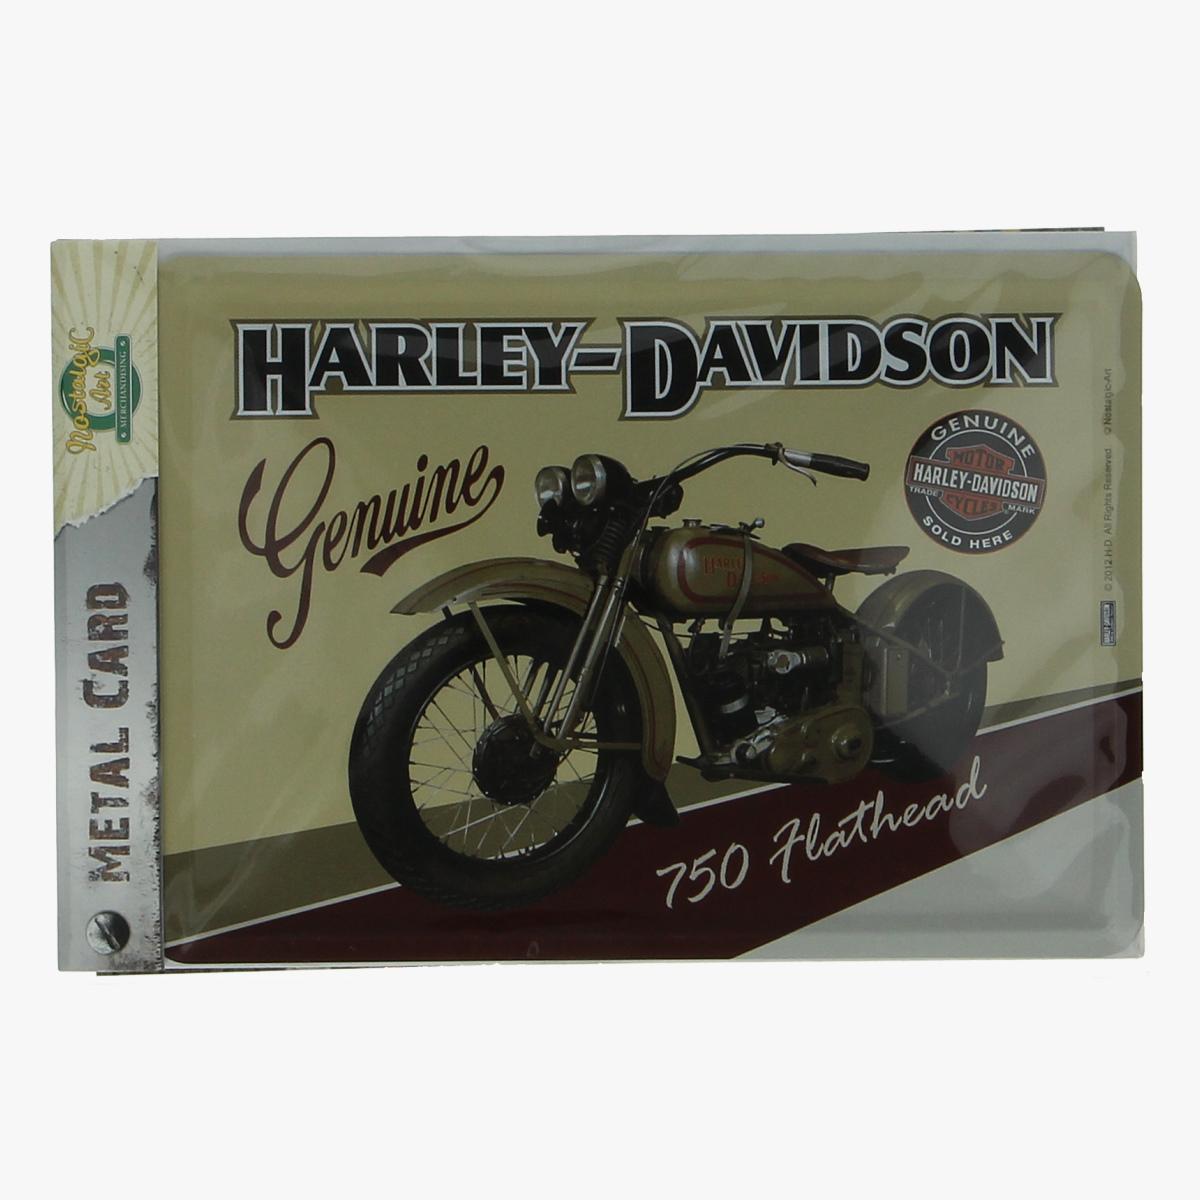 Afbeeldingen van metal card Harley-Davidson Genuine